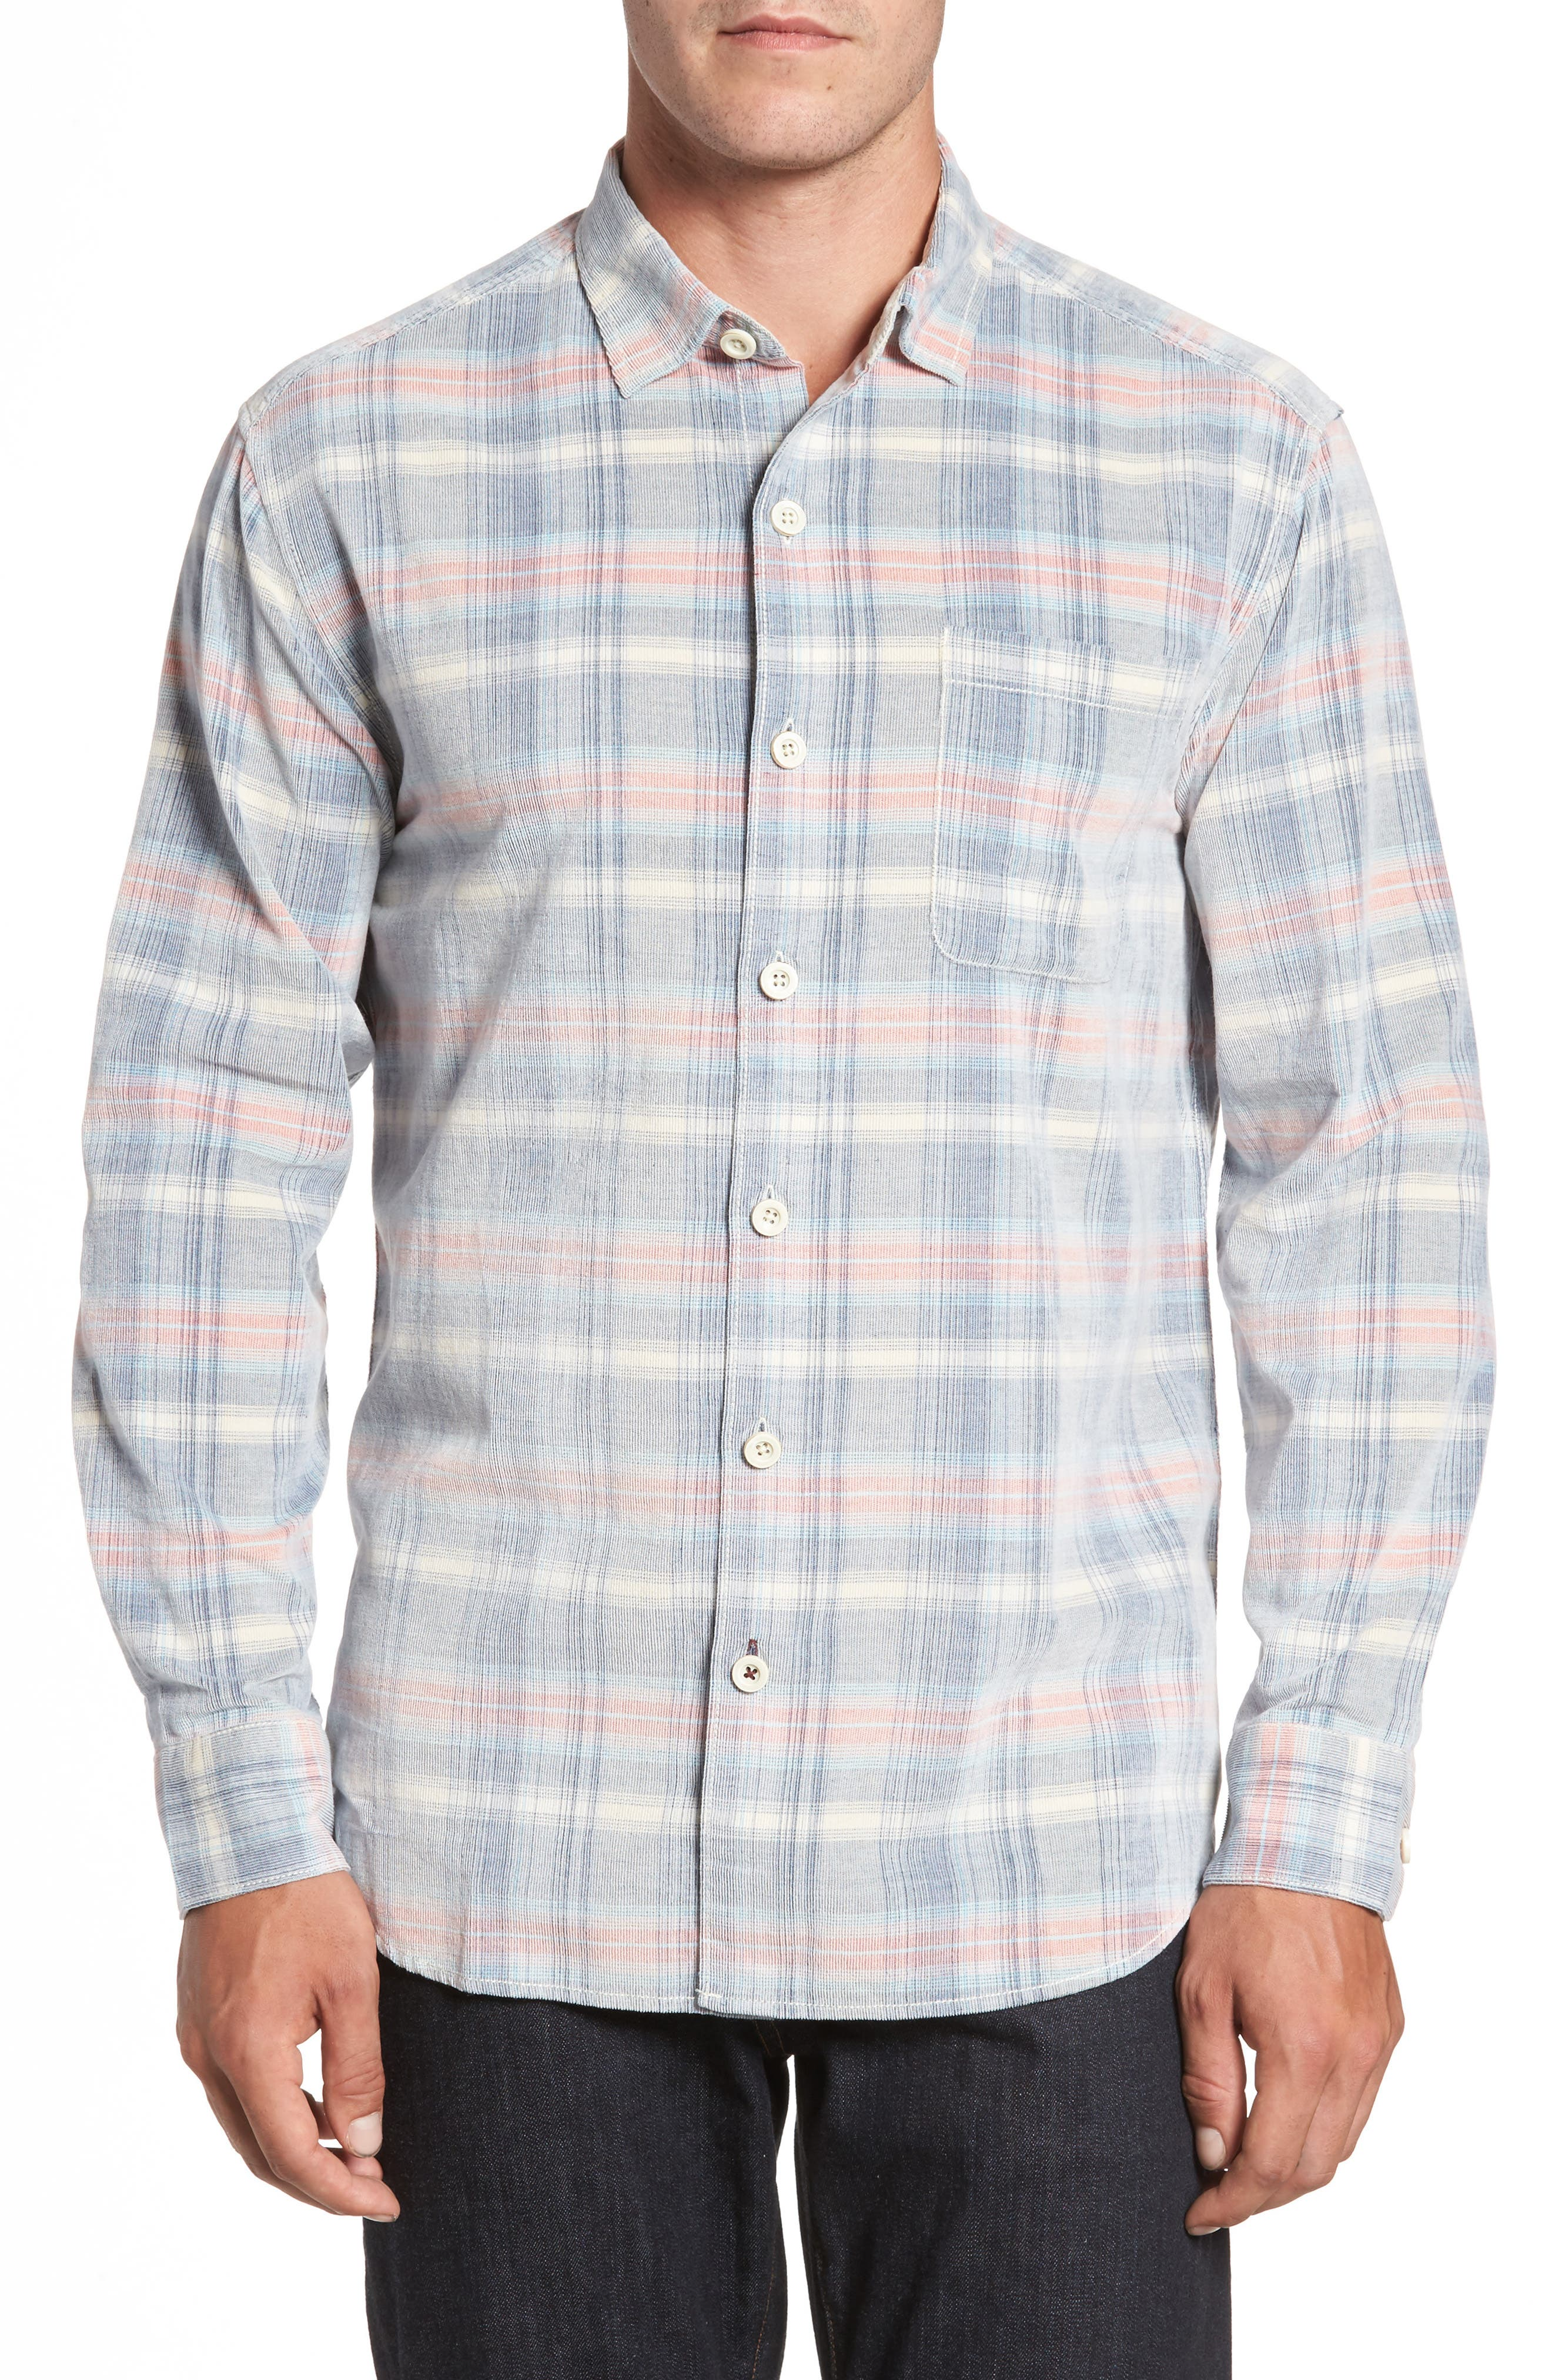 Cordwalk Plaid Plaid Sport Shirt,                             Main thumbnail 1, color,                             400